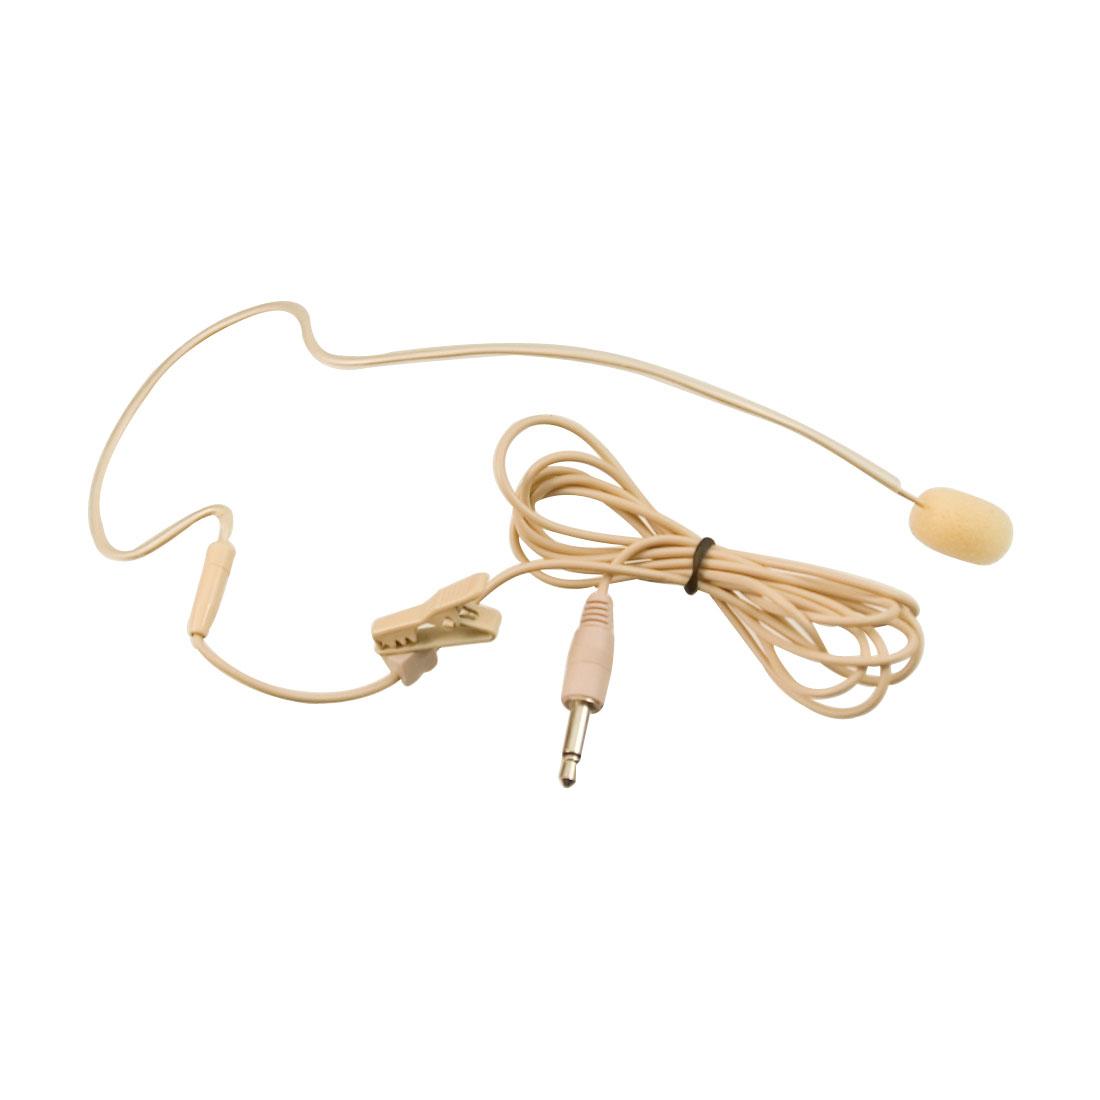 VoiceBooster Low Profile Single Earhook Omnidirectional Microphone